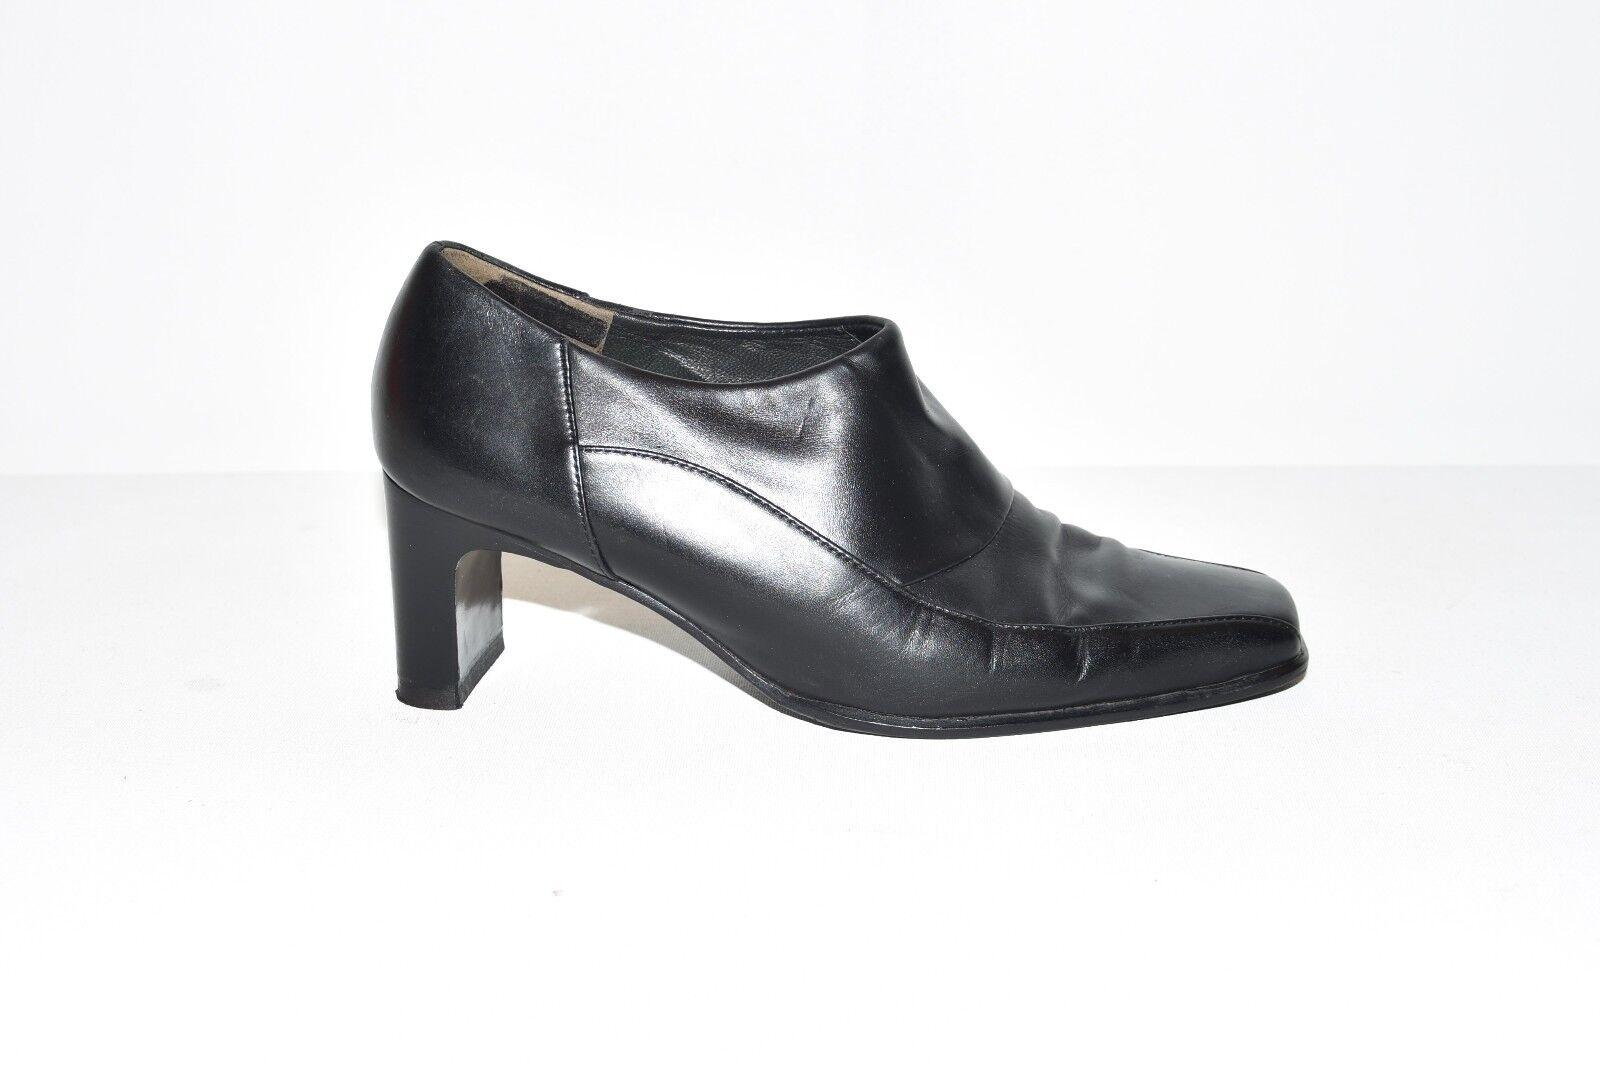 Black Leather PAUL GREEN Slip On Slim Mid Heel Court Women's shoes Size 3.5 36.5